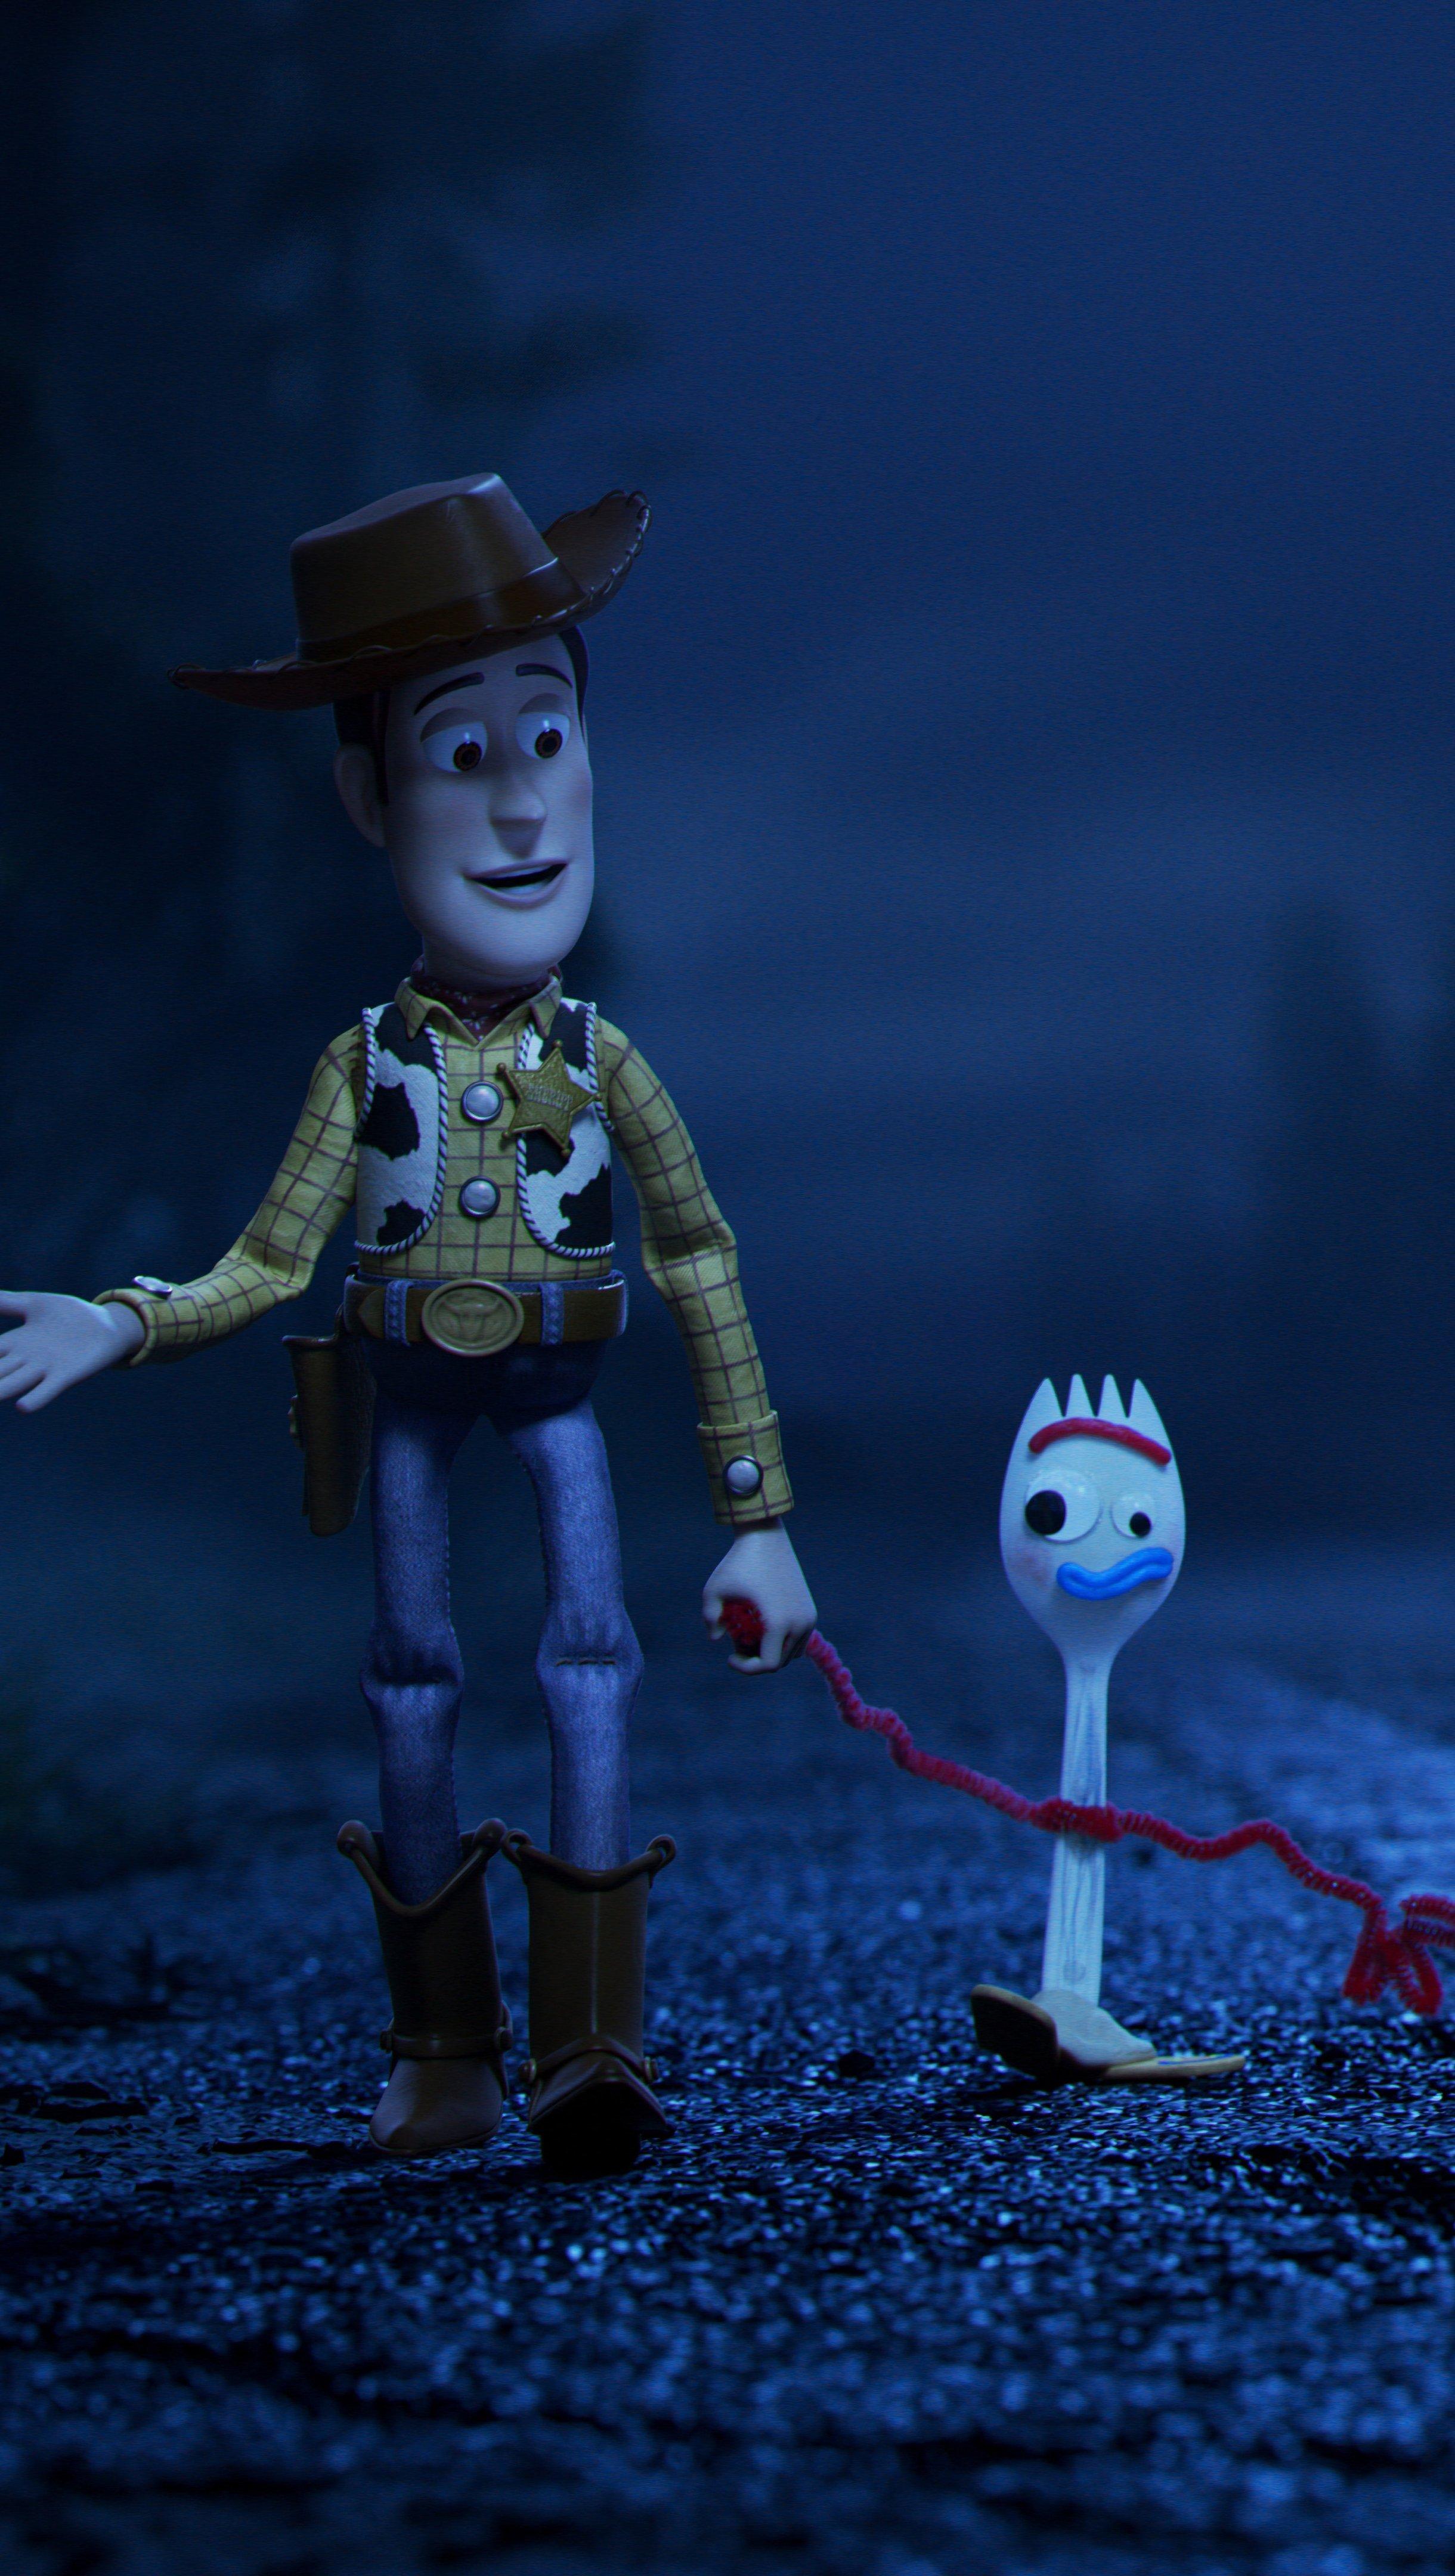 Fondos de pantalla Toy Story 4 Woody y Forky Vertical